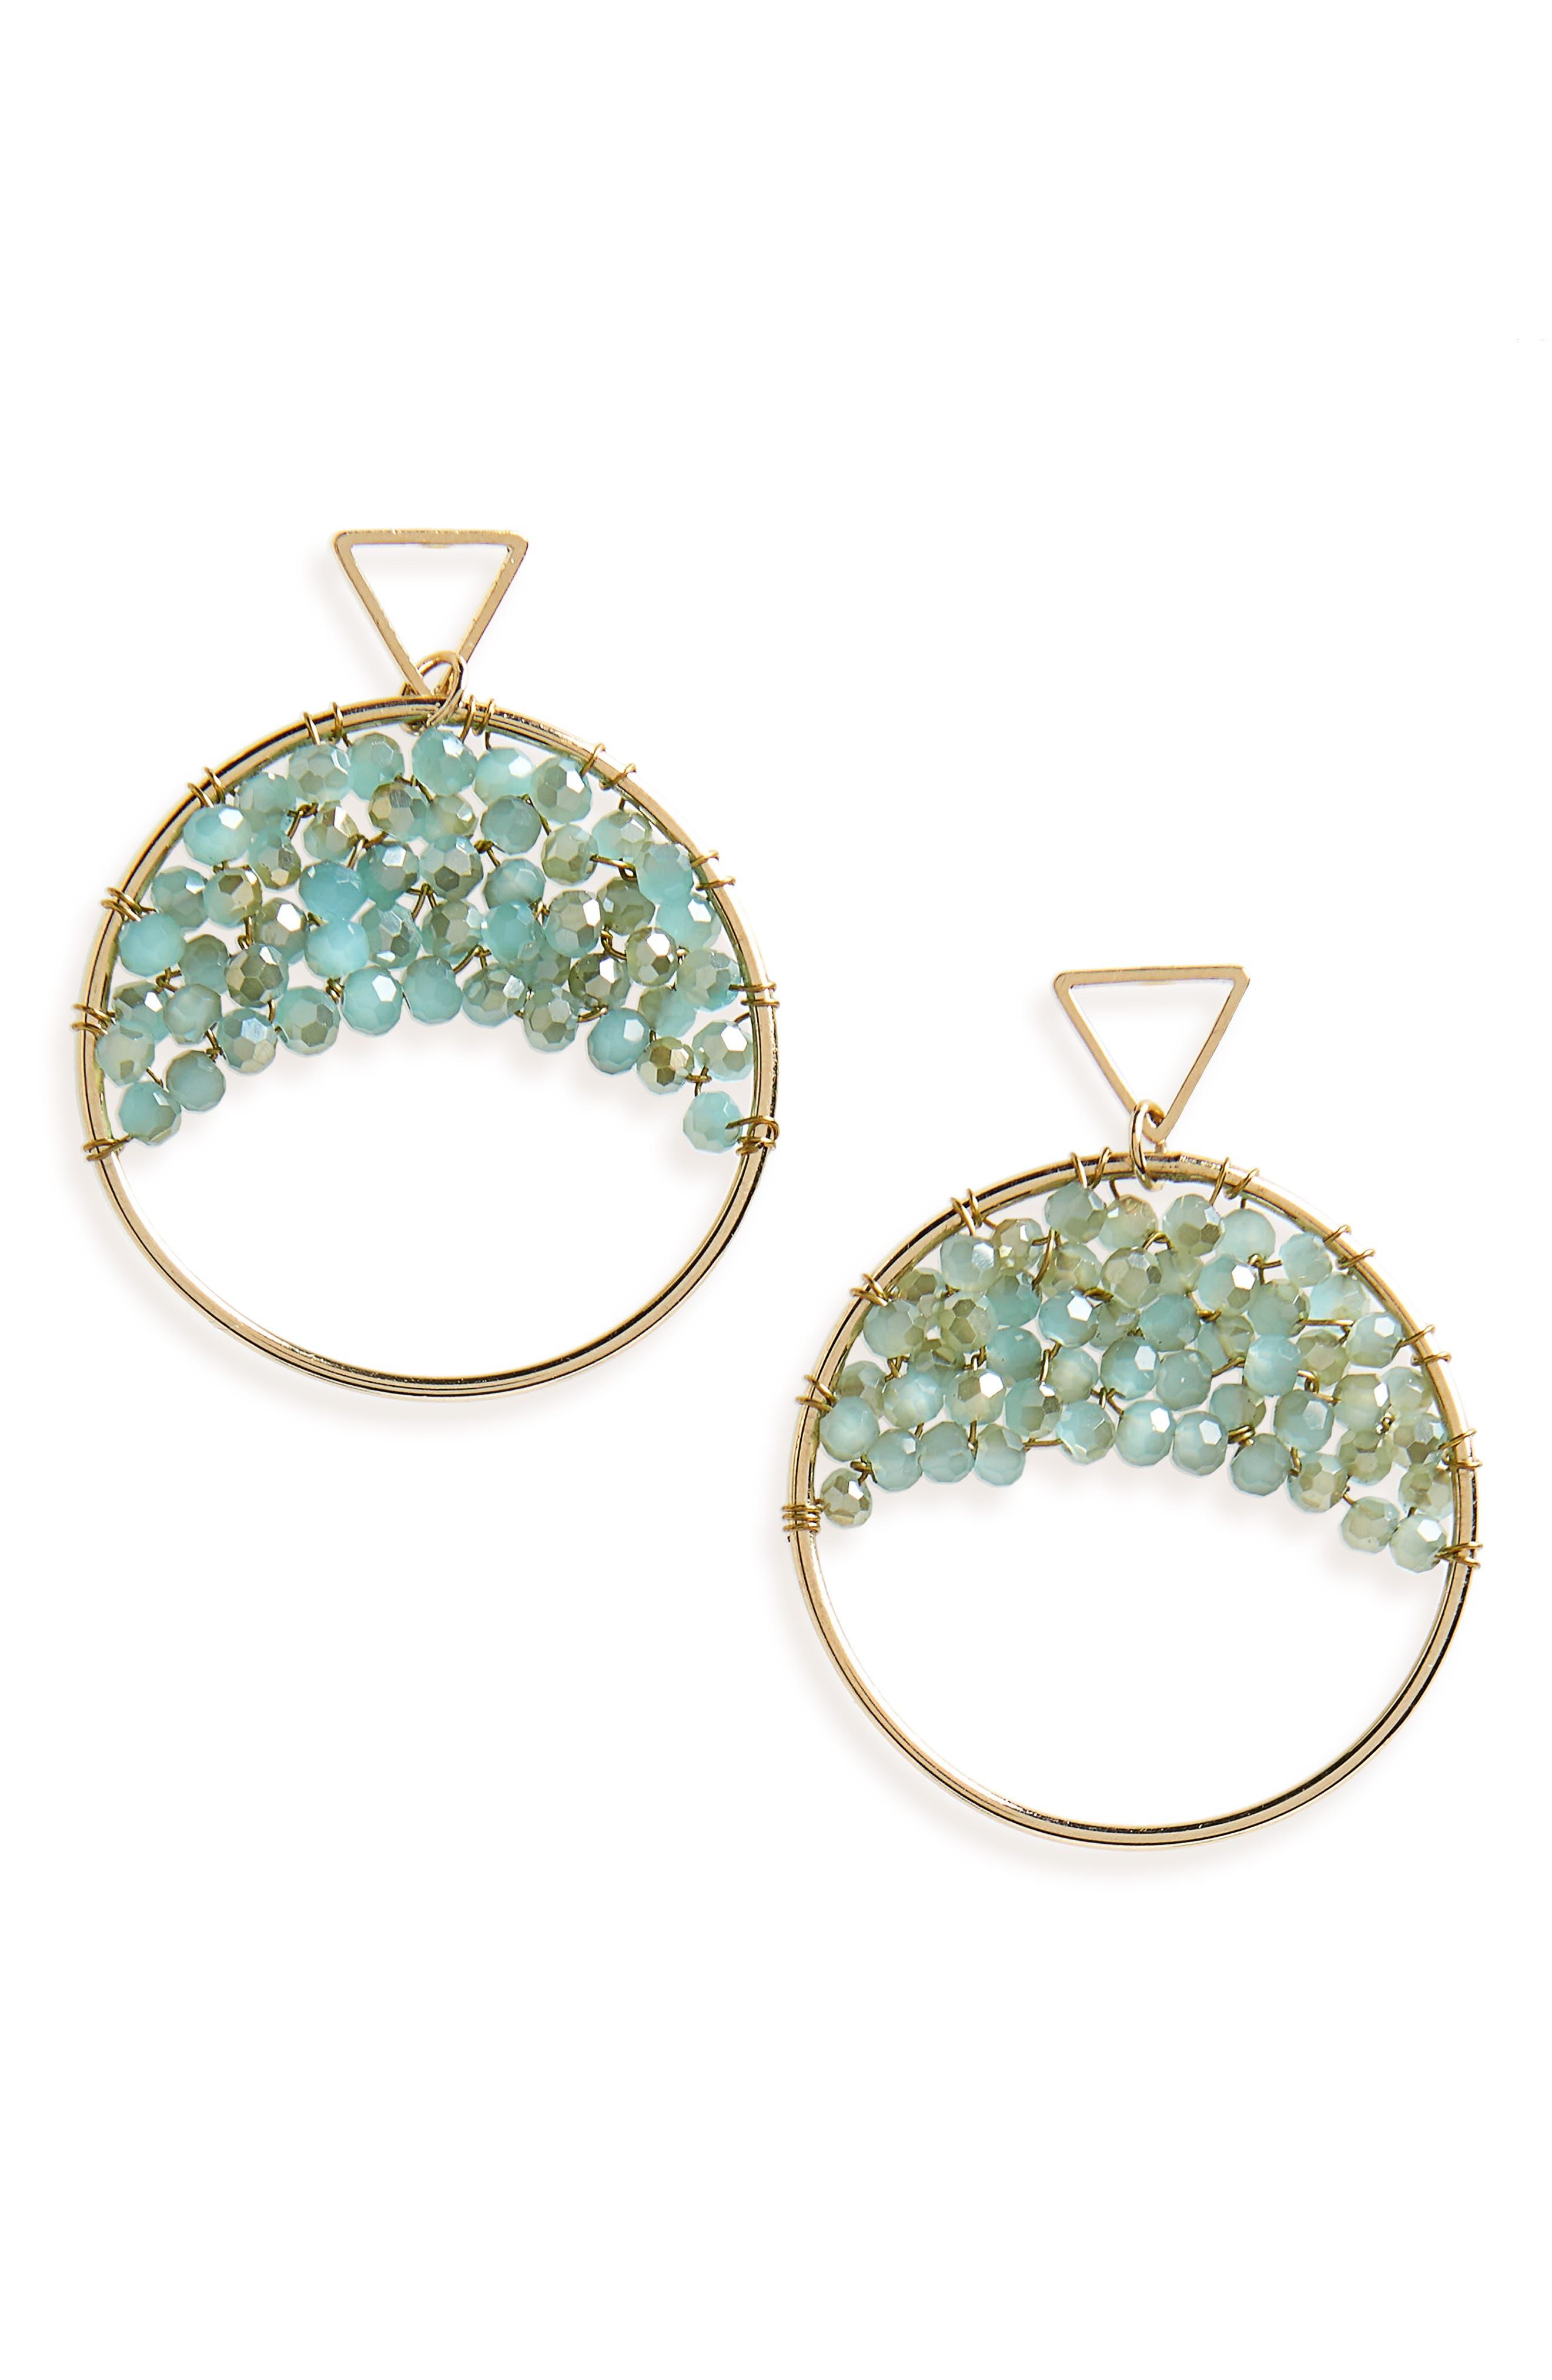 Crystal Beaded Circle Earrings,                             Main thumbnail 1, color,                             MINT